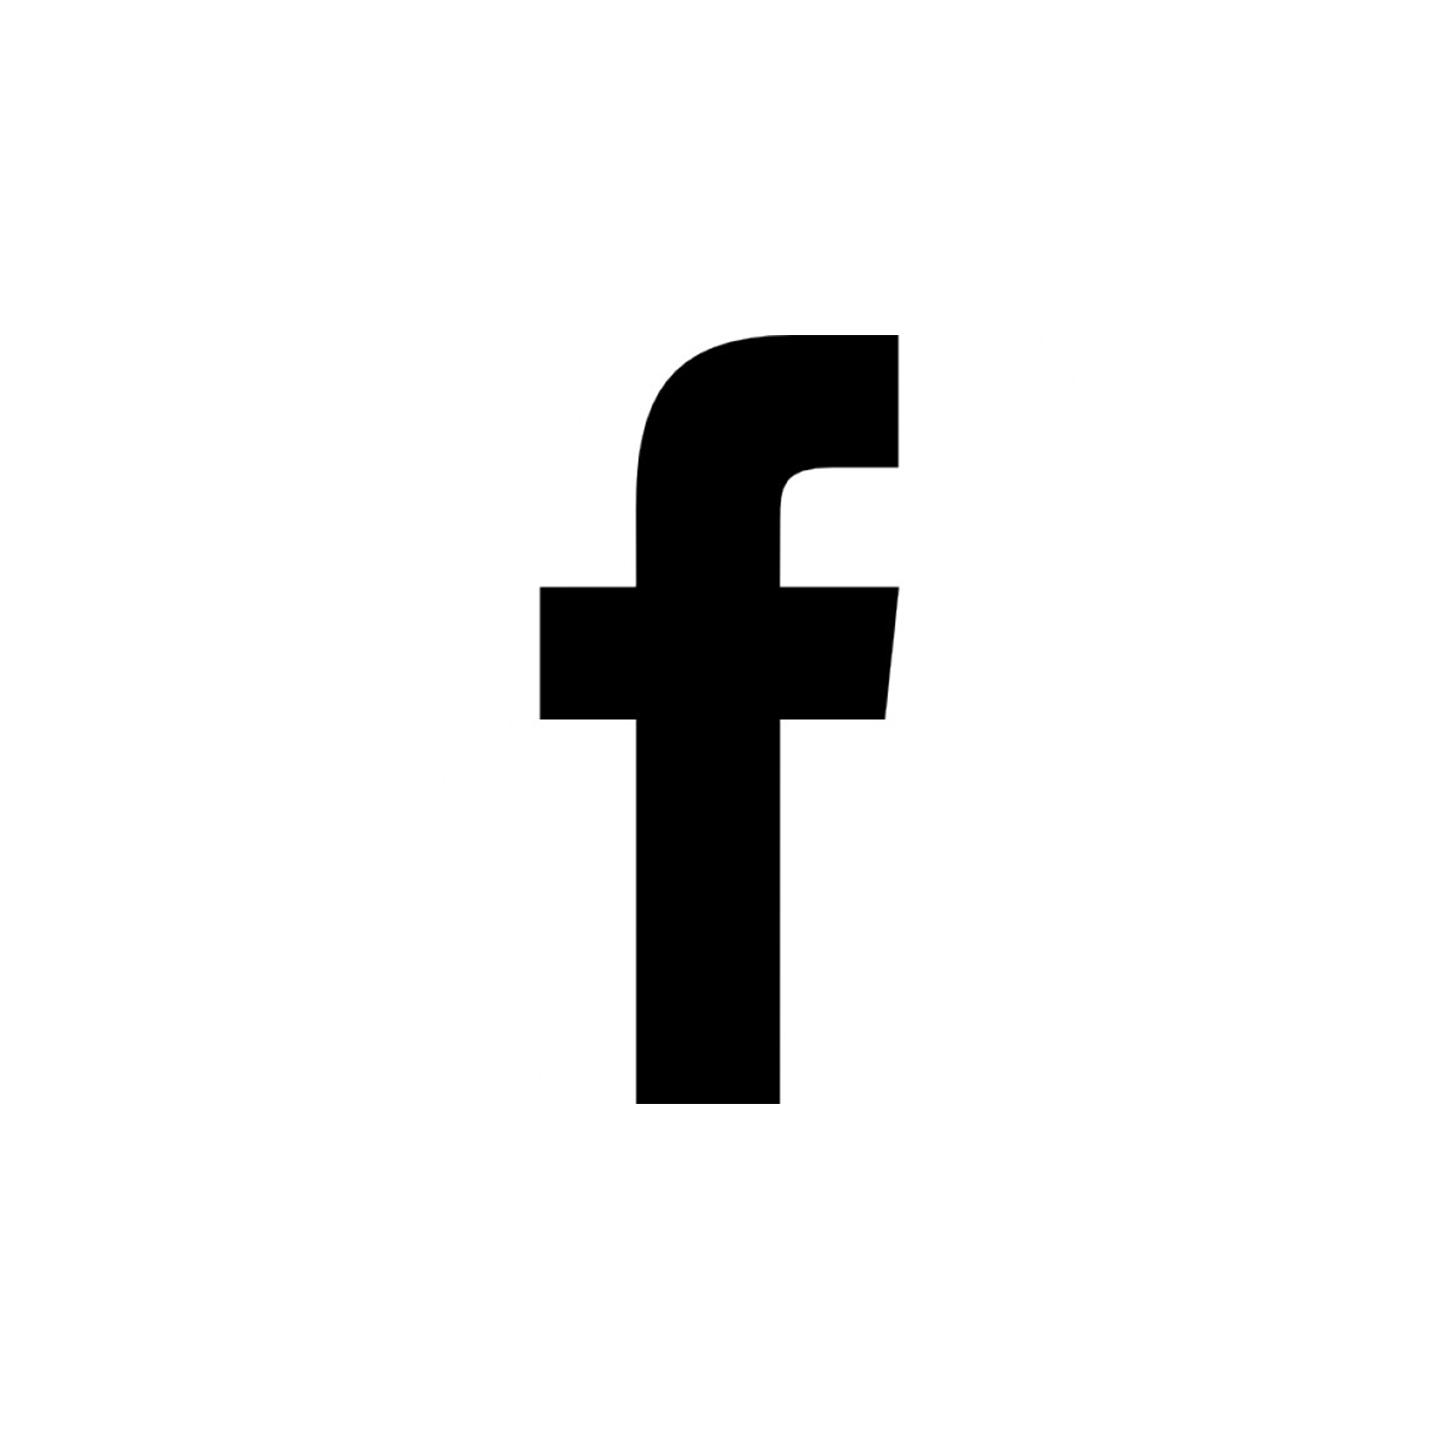 tamara's catering facebook page